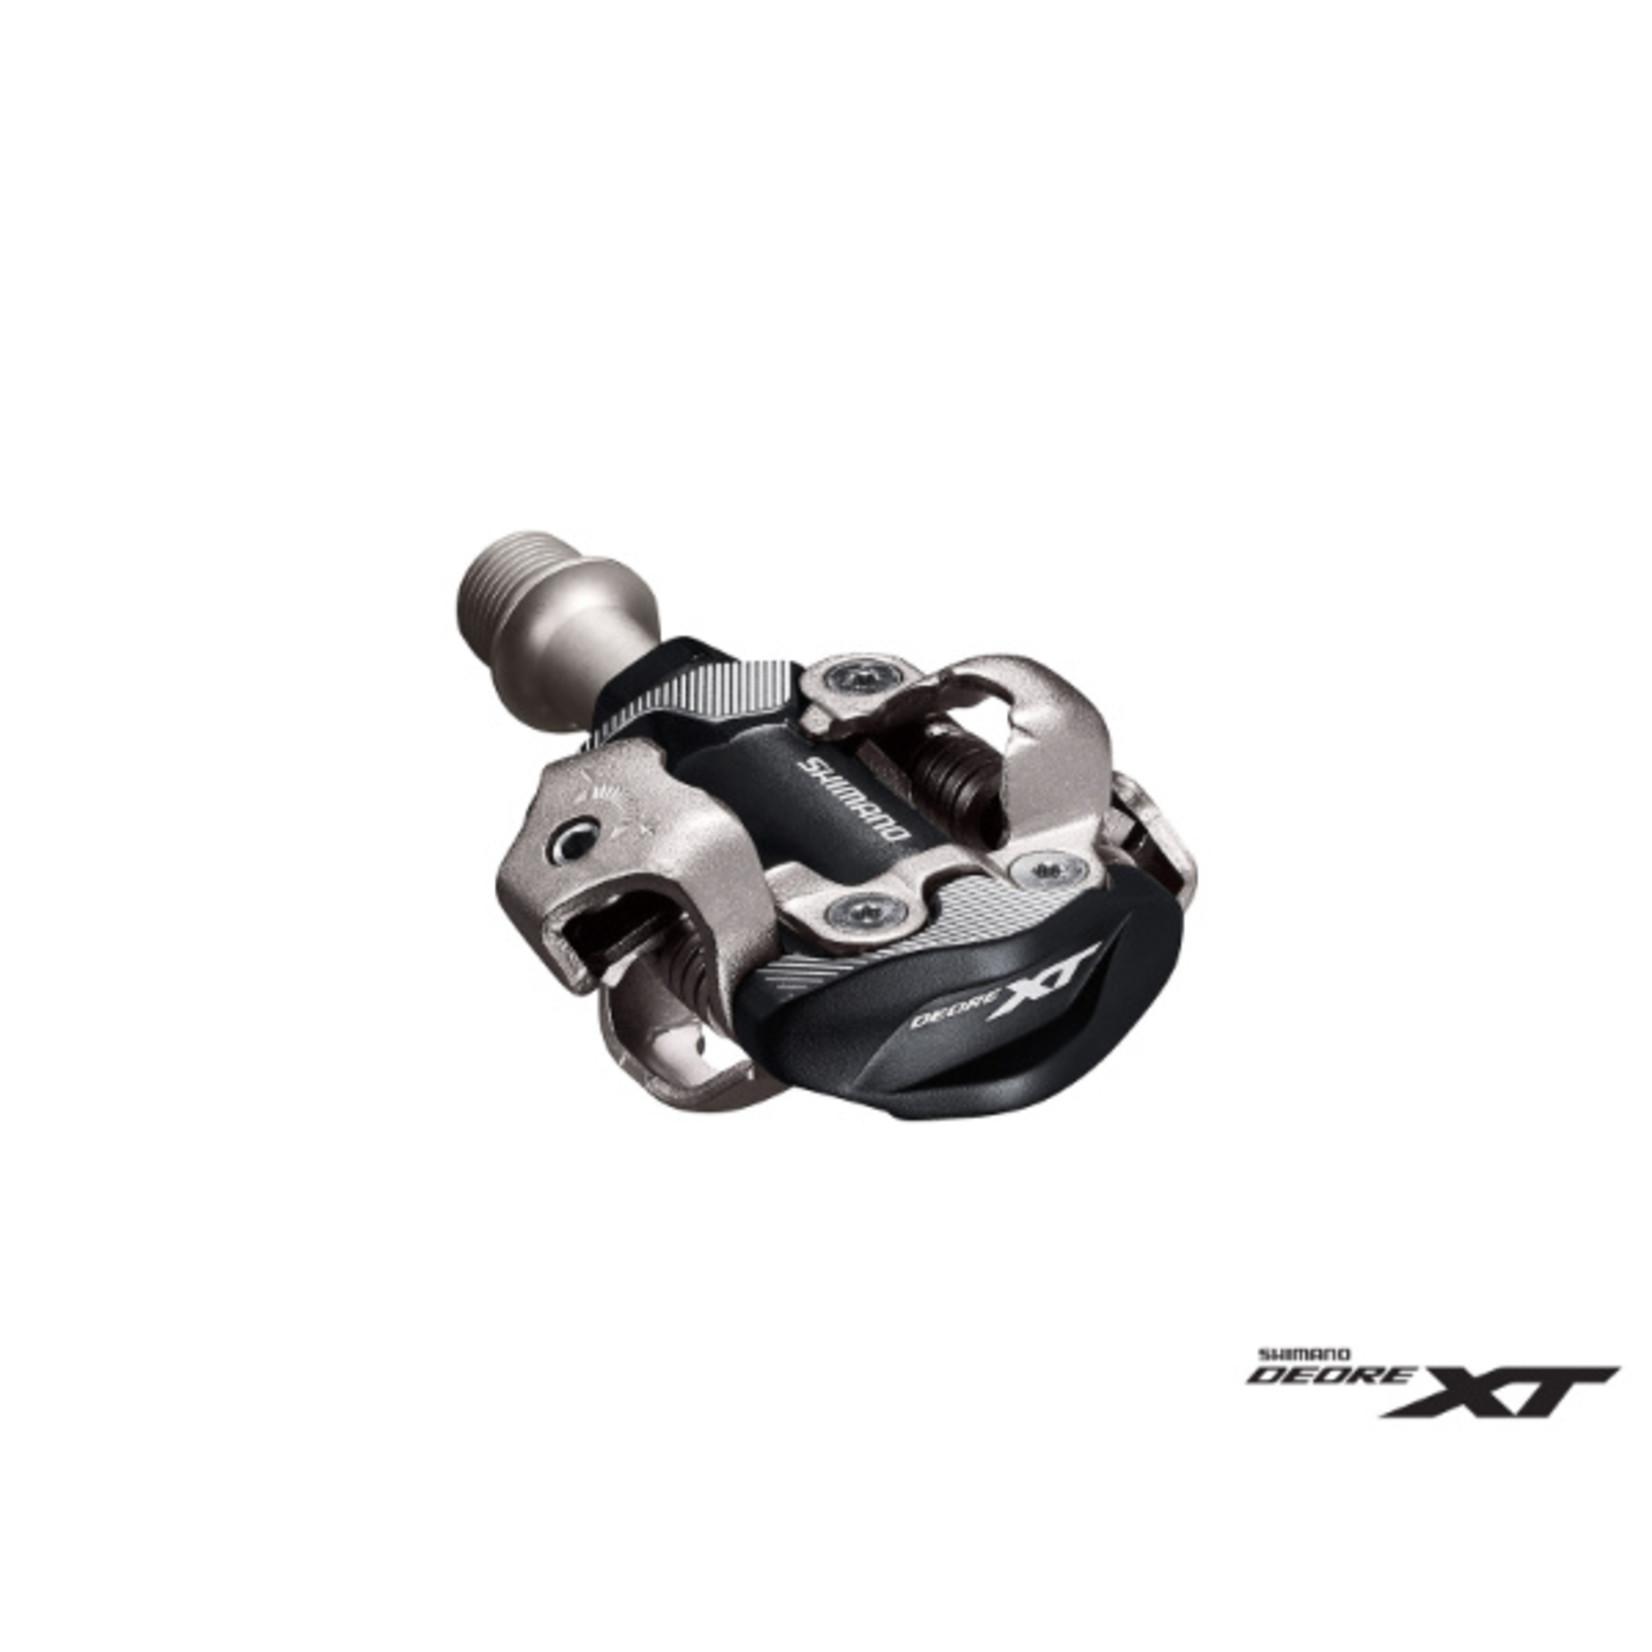 Shimano Shimano, PD-M8100 SPD Pedals Deore XT Race/XC